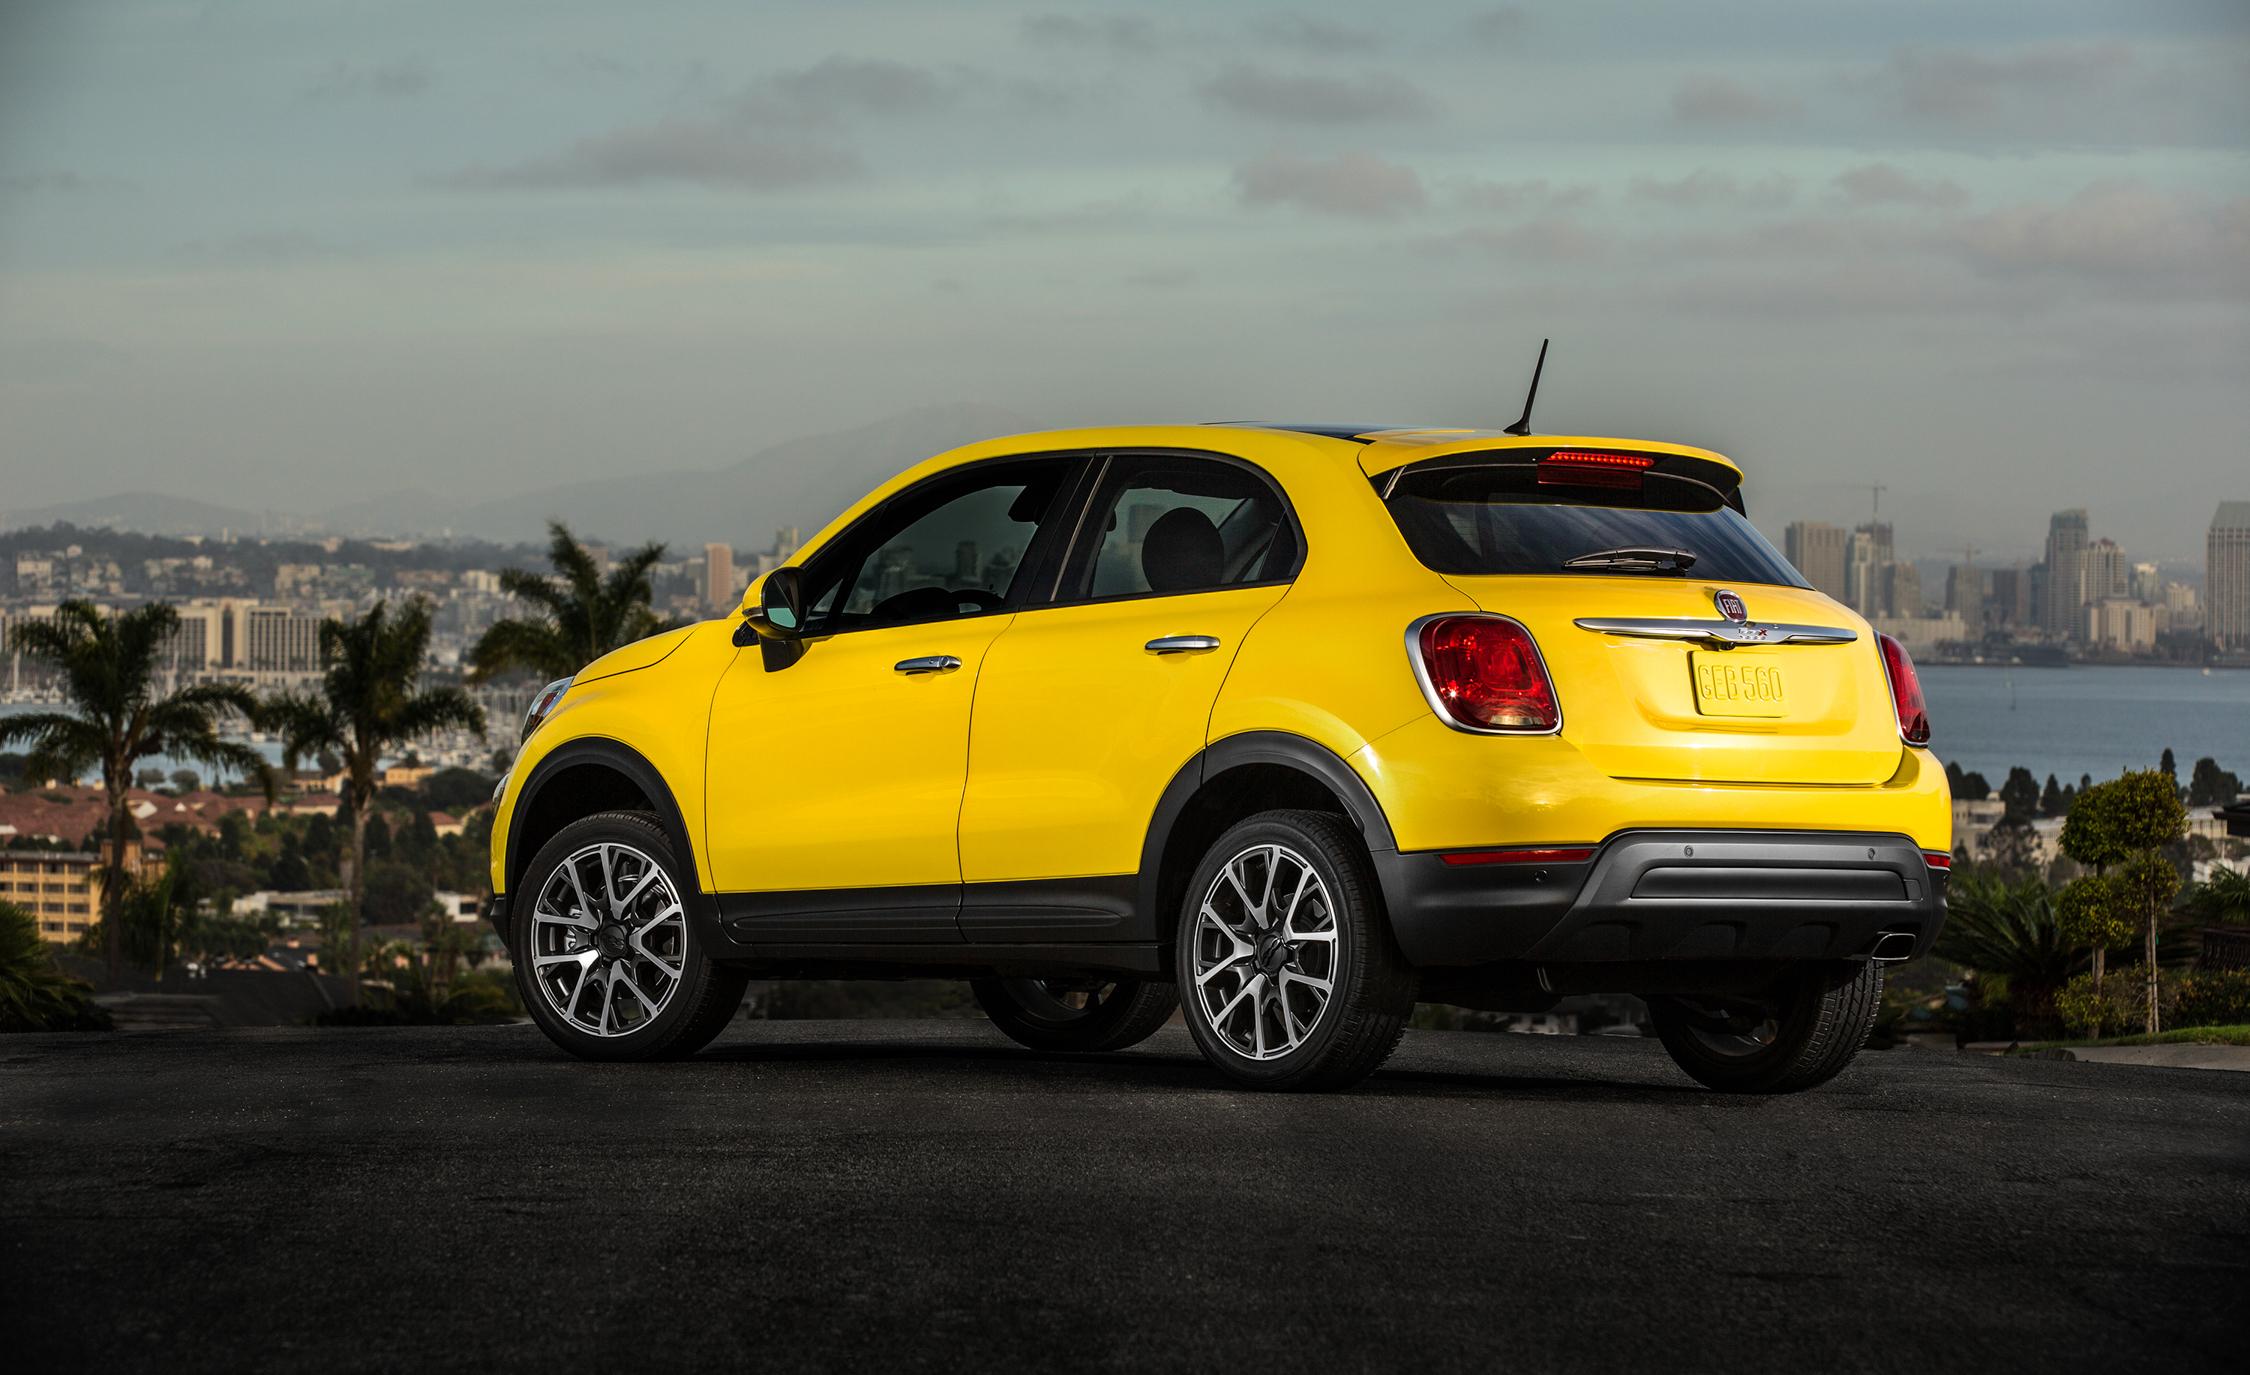 2016 Fiat 500X Trekking Plus Yellow Exterior Rear Side View